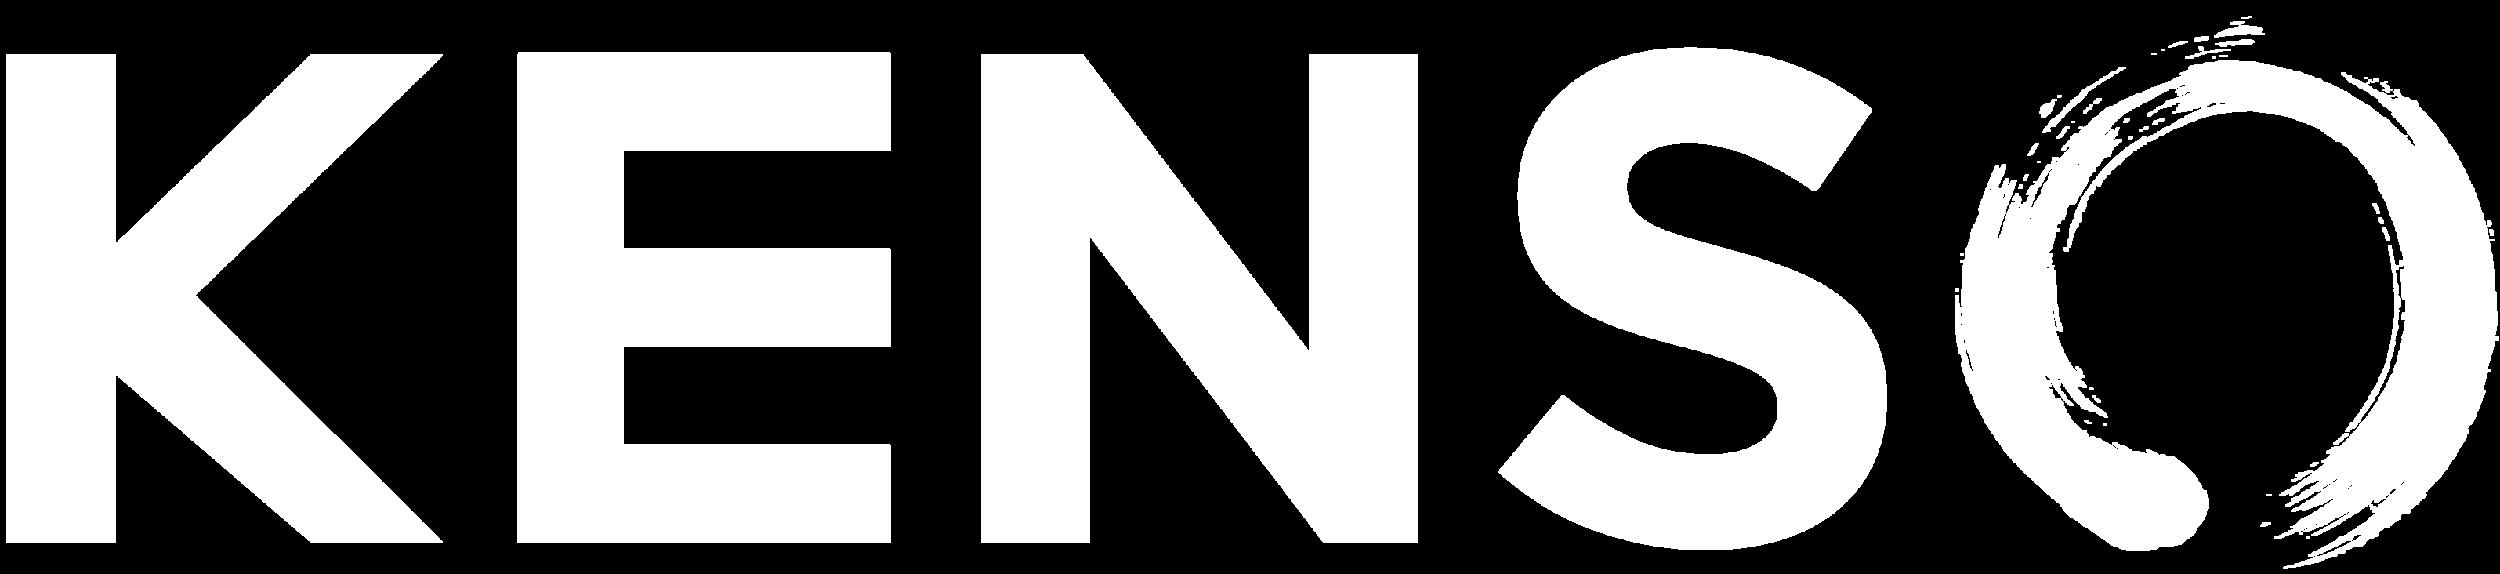 KENSO